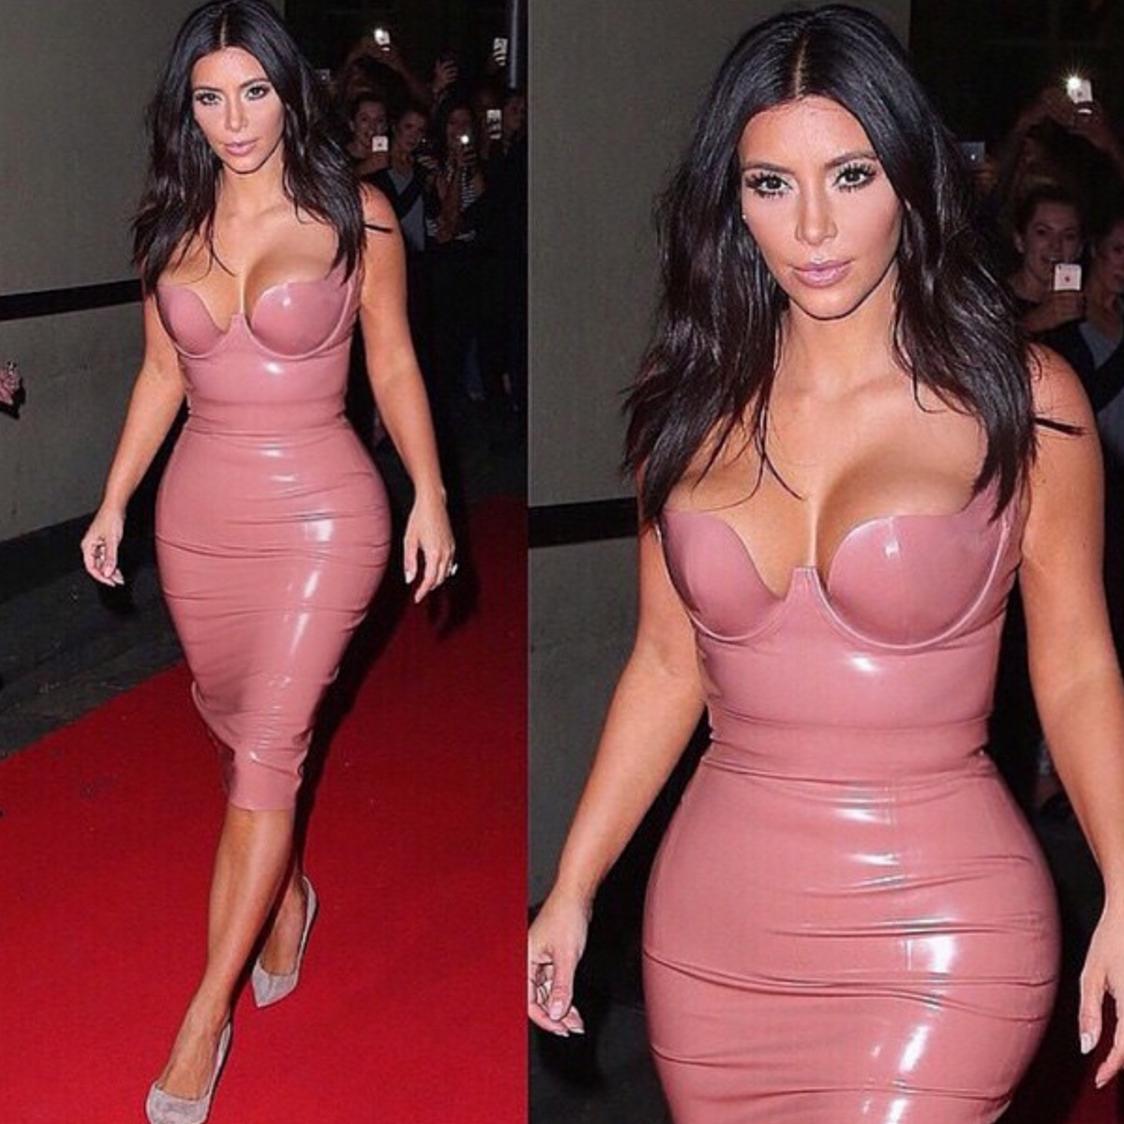 Kim Kardashian y otras famosas que adoran la ropa ajustada: ¿sexy o ...